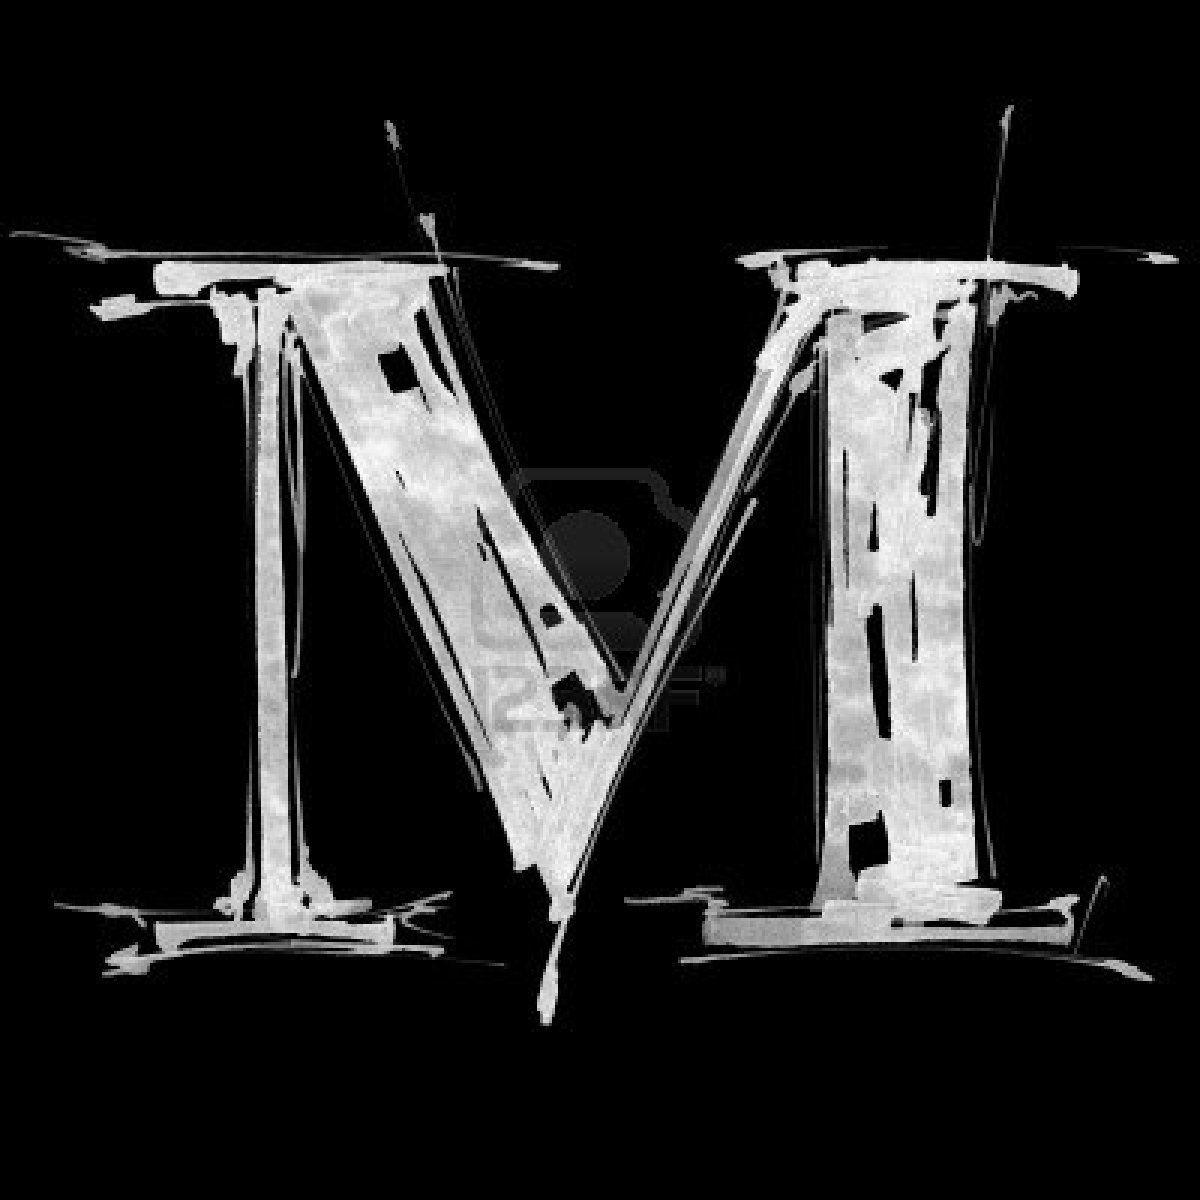 Image Detail For Letter M Alphabet Symbol Grunge Hand Draw Paint